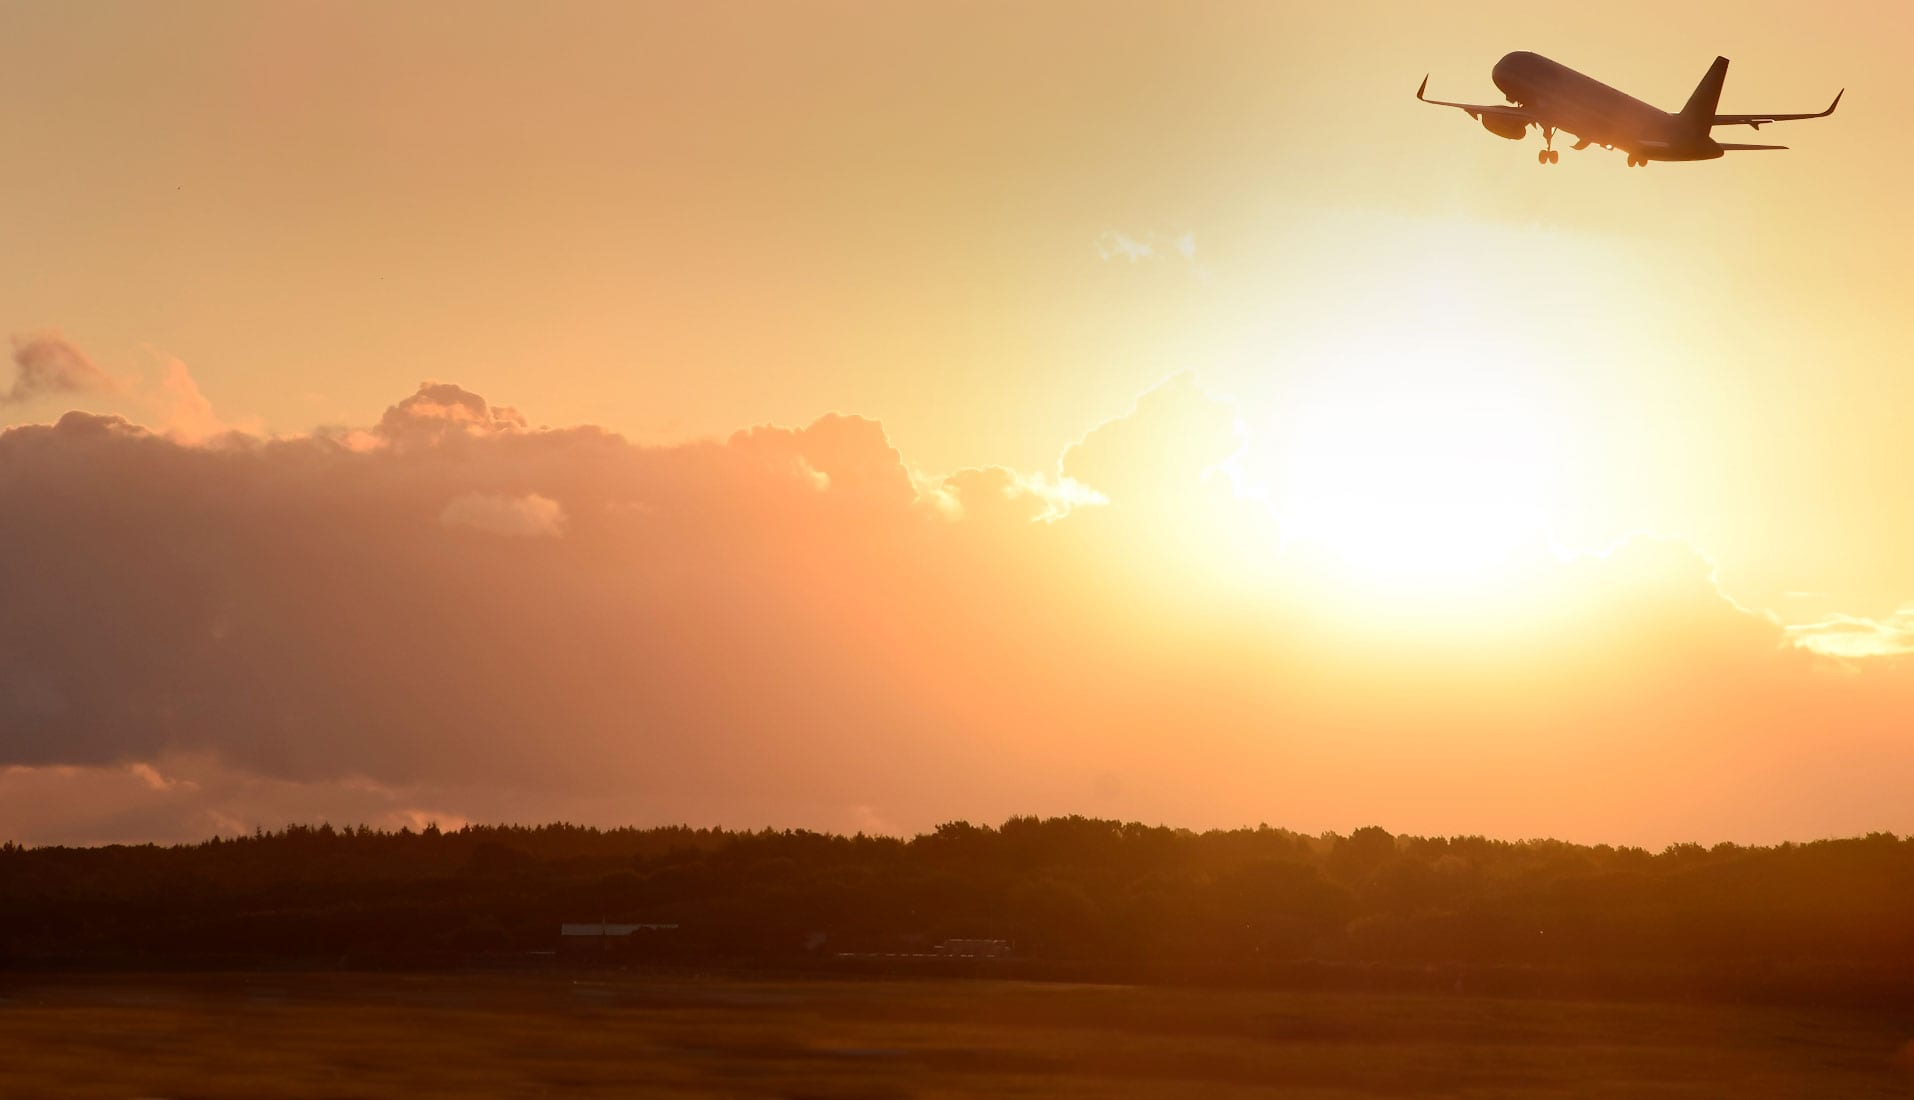 OneTravel.com: Up to $40 off Flight Deals